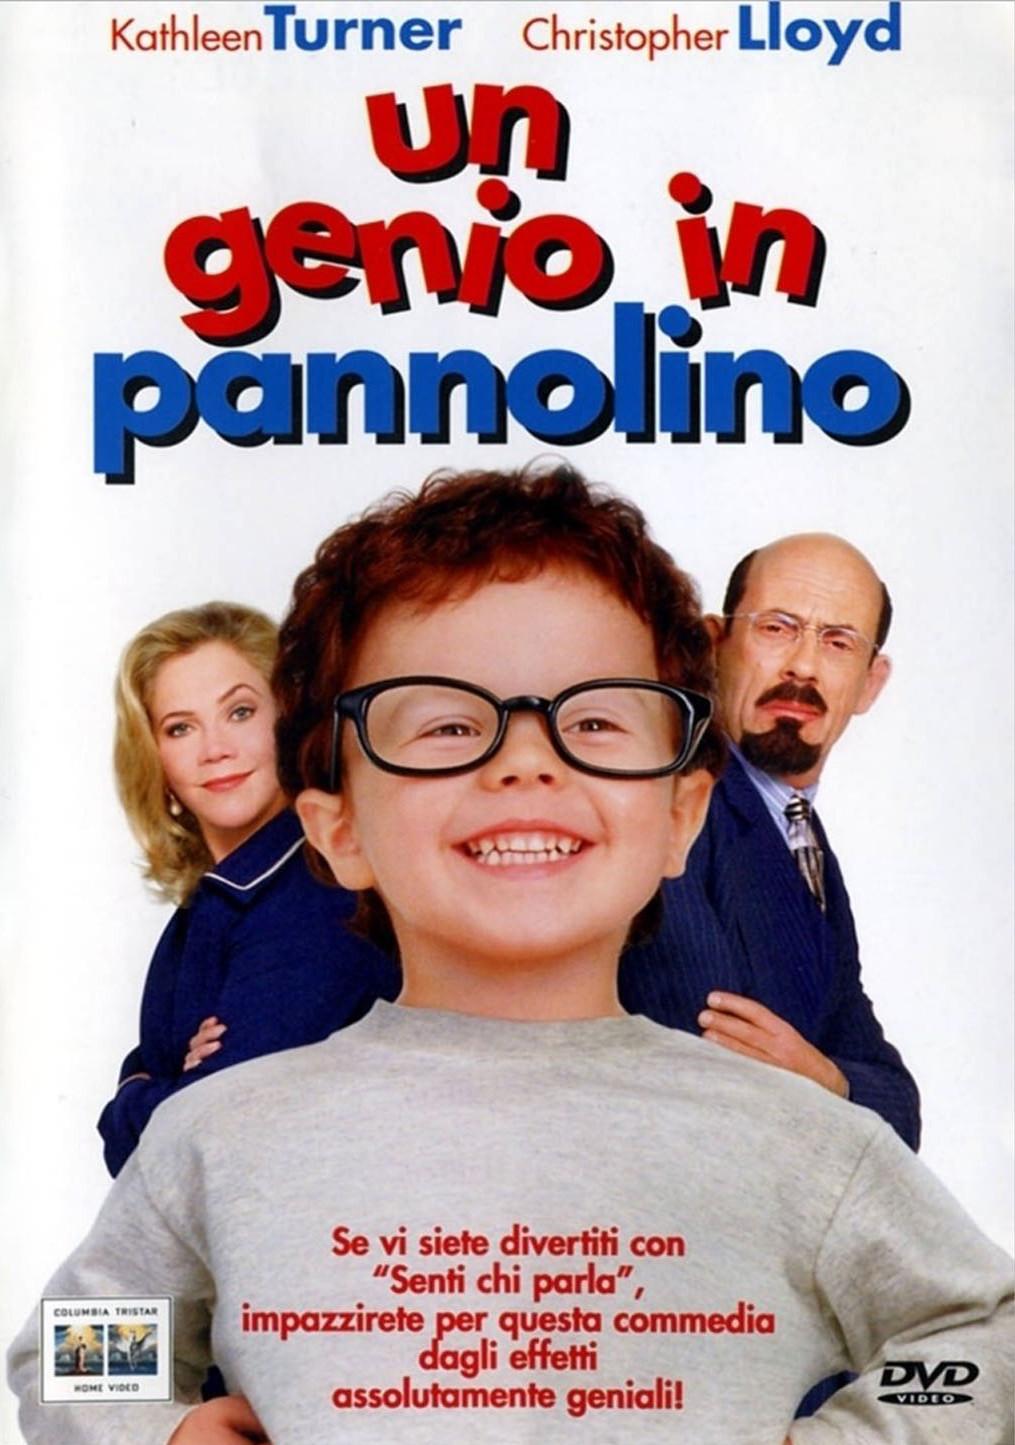 Baby geniuses - Un genio in pannolino, locandina del film